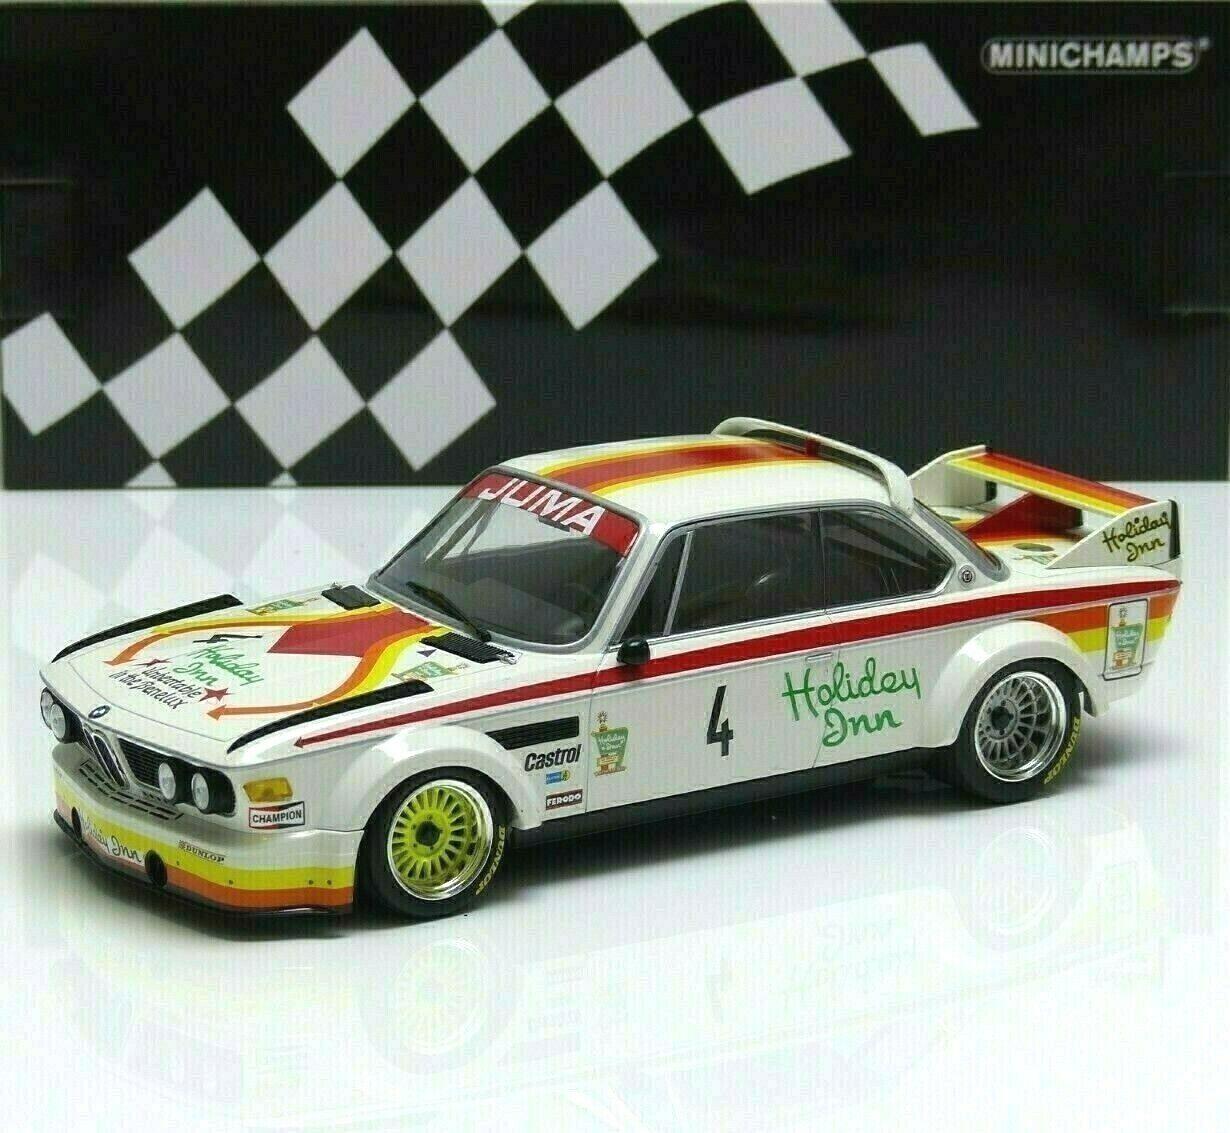 Bmw 3,0 CSL  4 corbisier, joosen, berndtson, GP nurburgring 1976 Minichamps 1 18